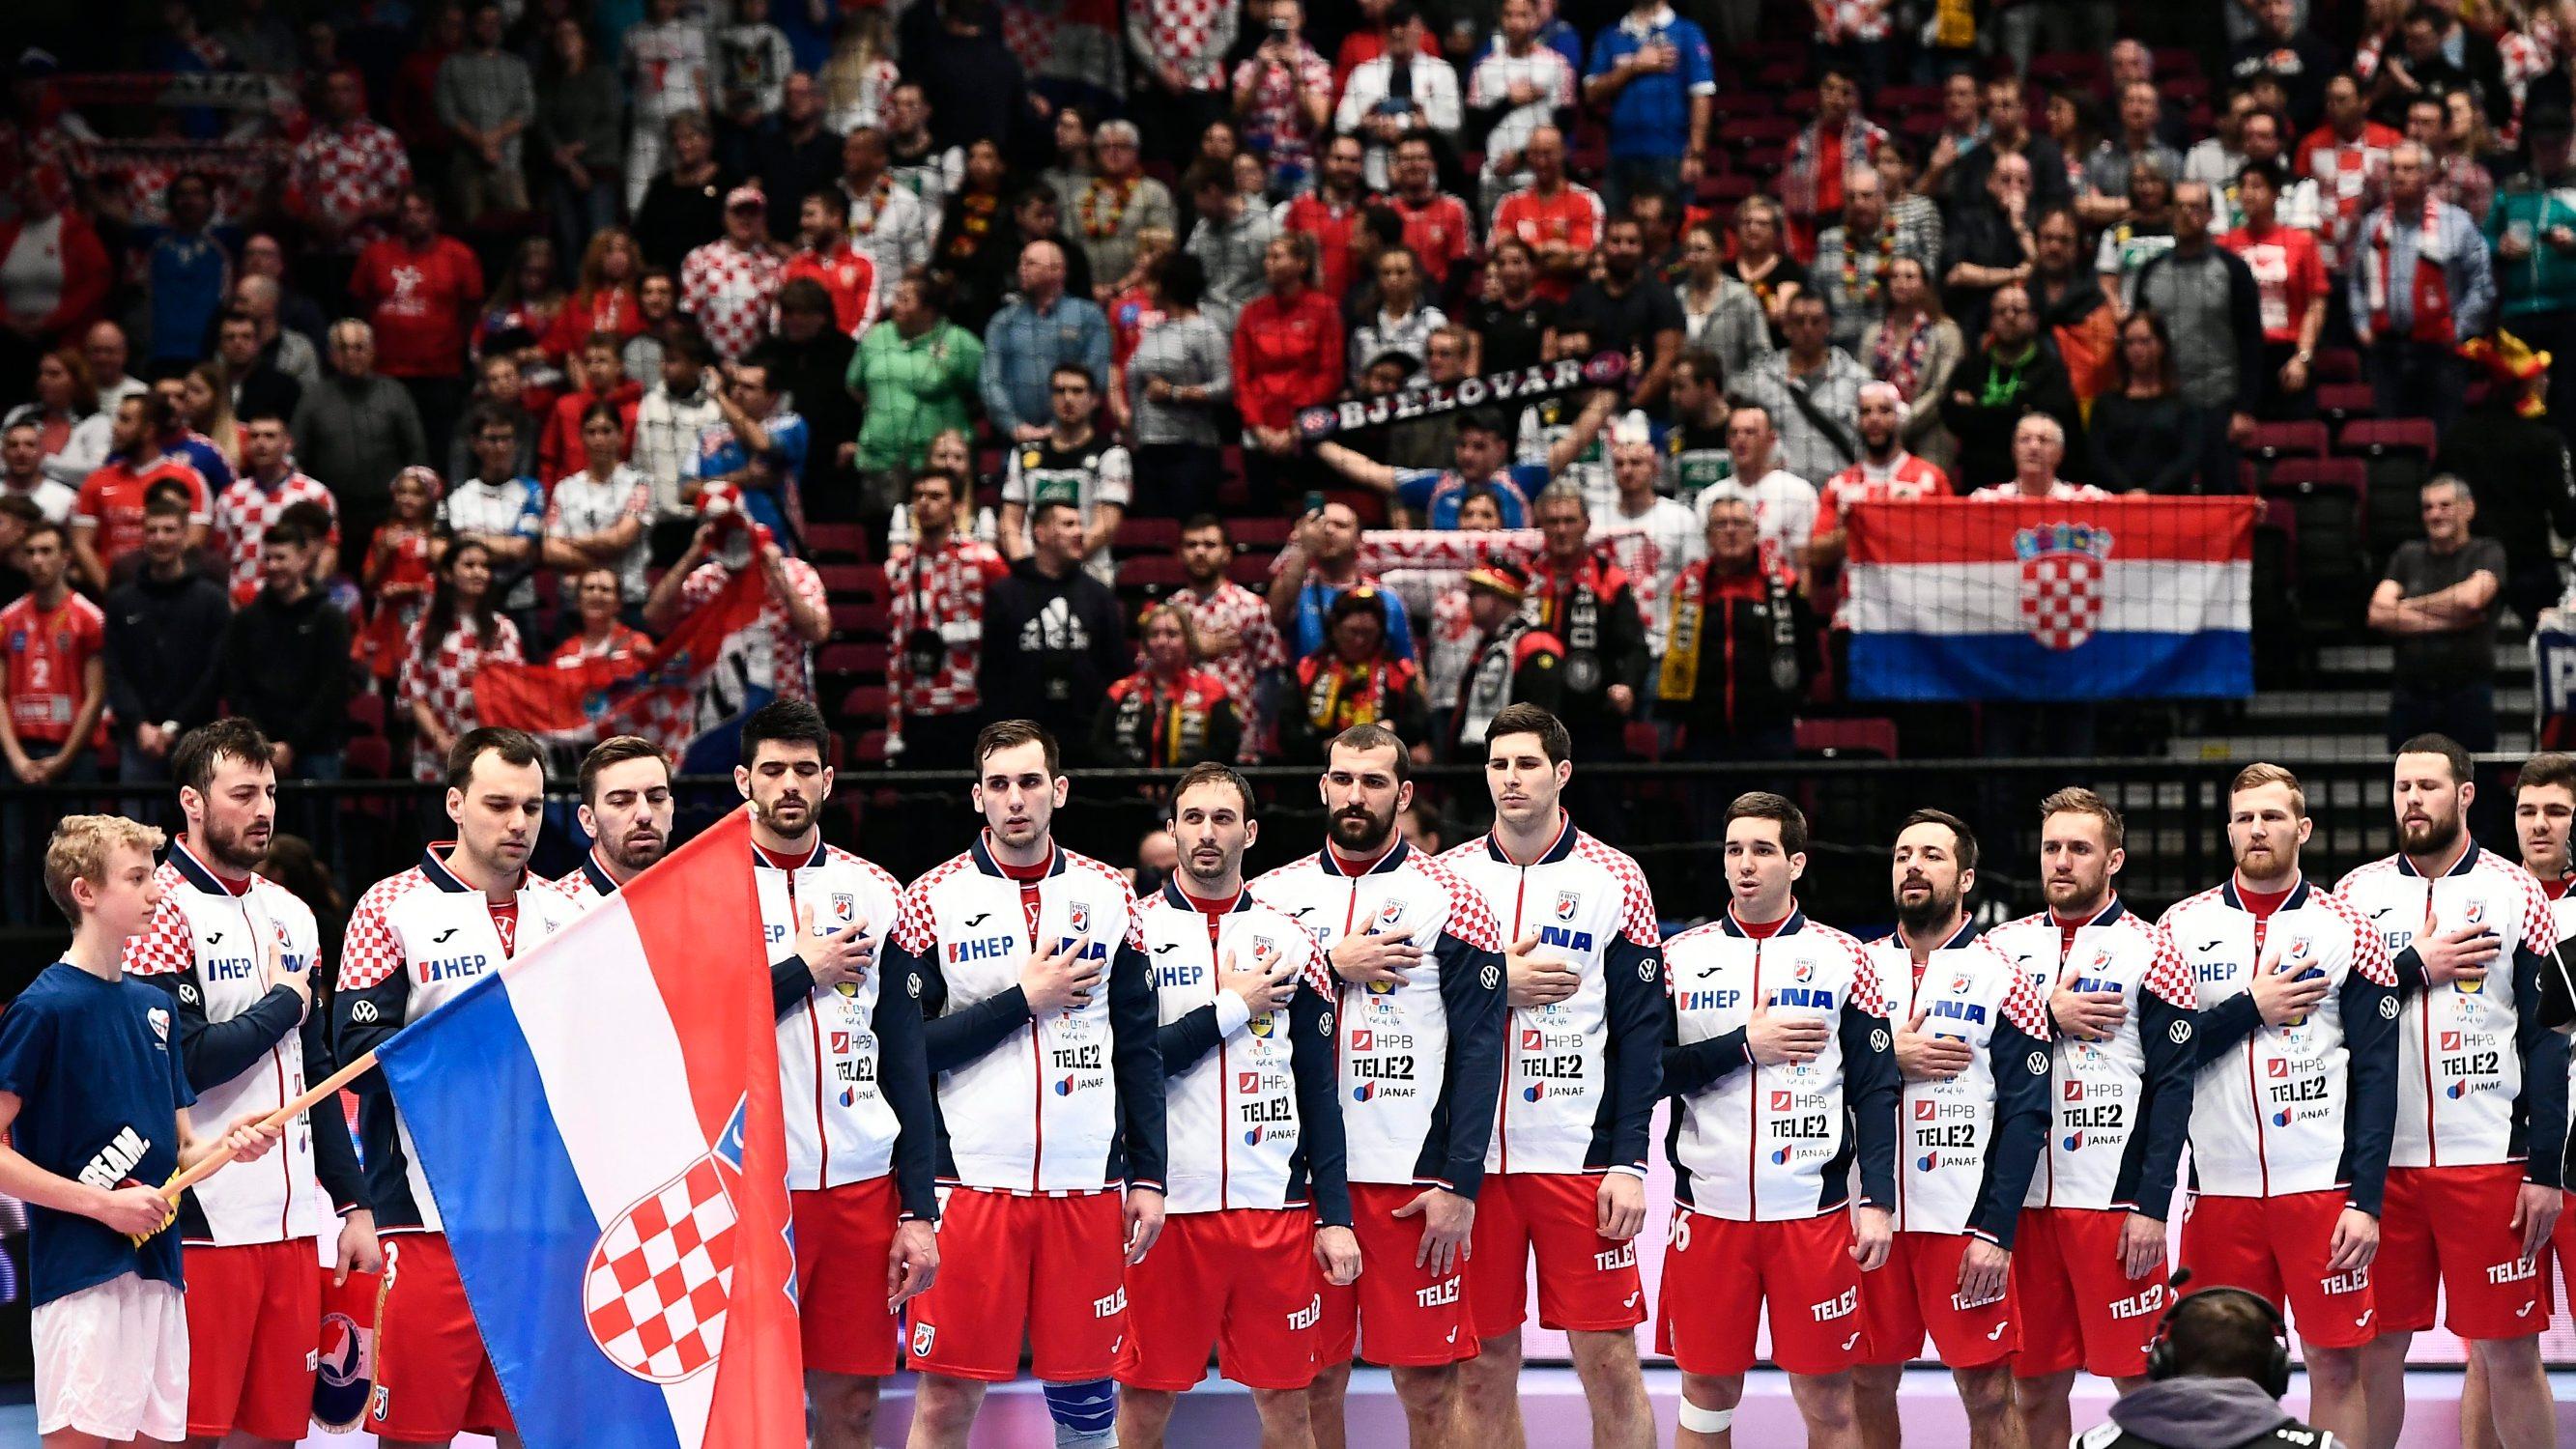 hrvatska_ceska4-200120